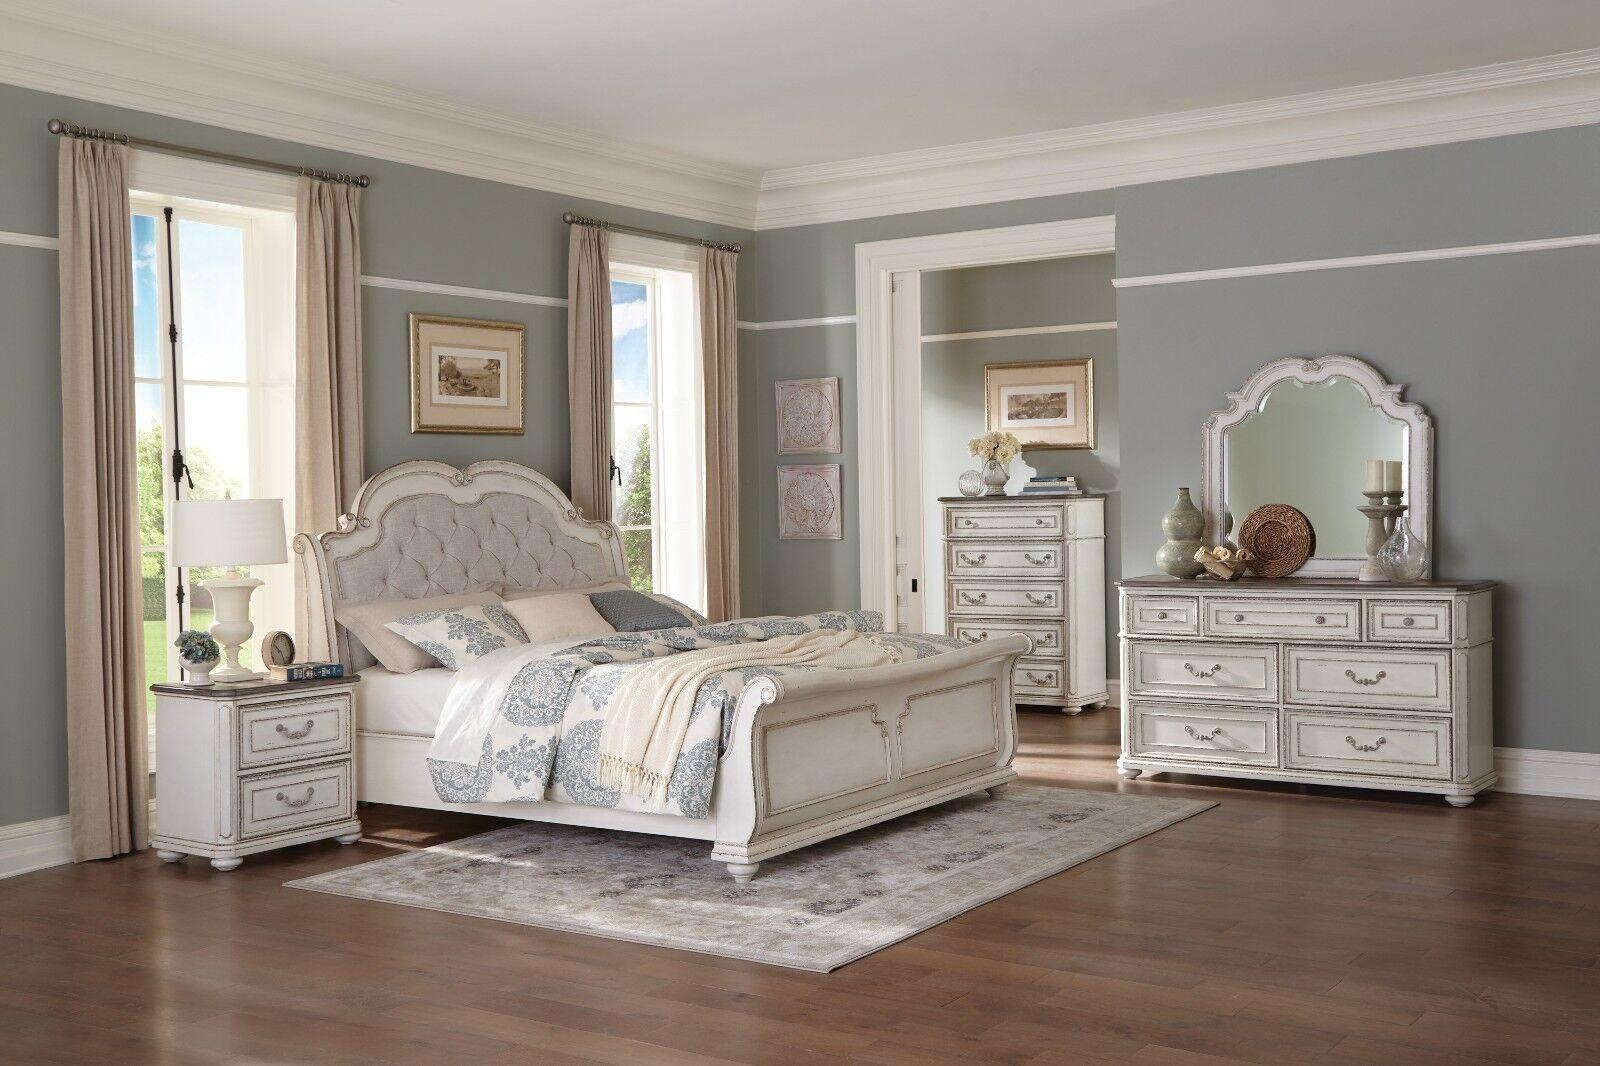 Euclid Contemporary Espresso 4pc Bedroom Set Queen Bed Dresser Mirror Nightstand For Sale Online Ebay